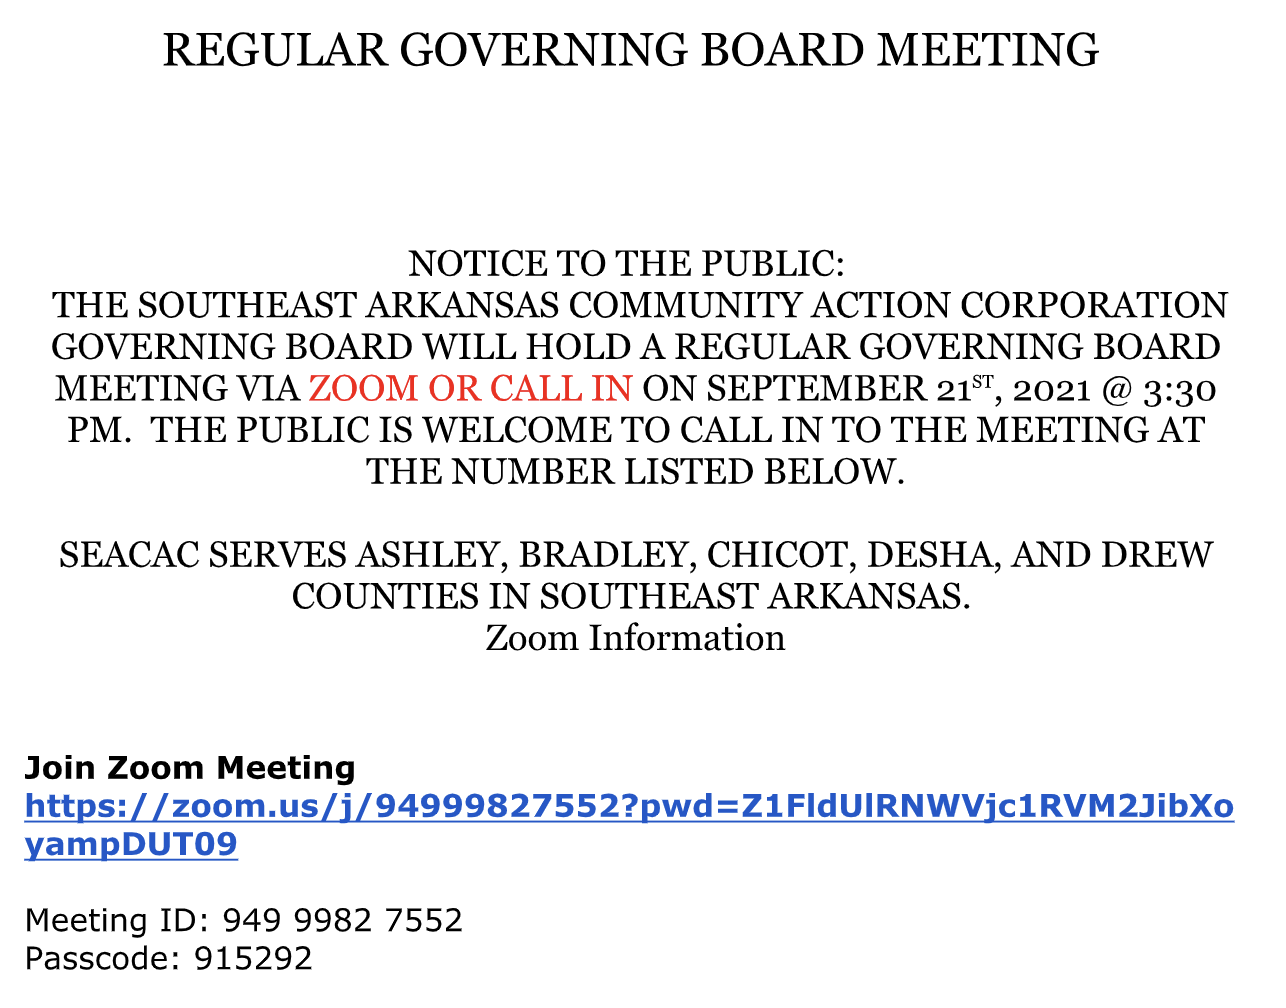 SEACAC Regular Governing Board Meeting September 21